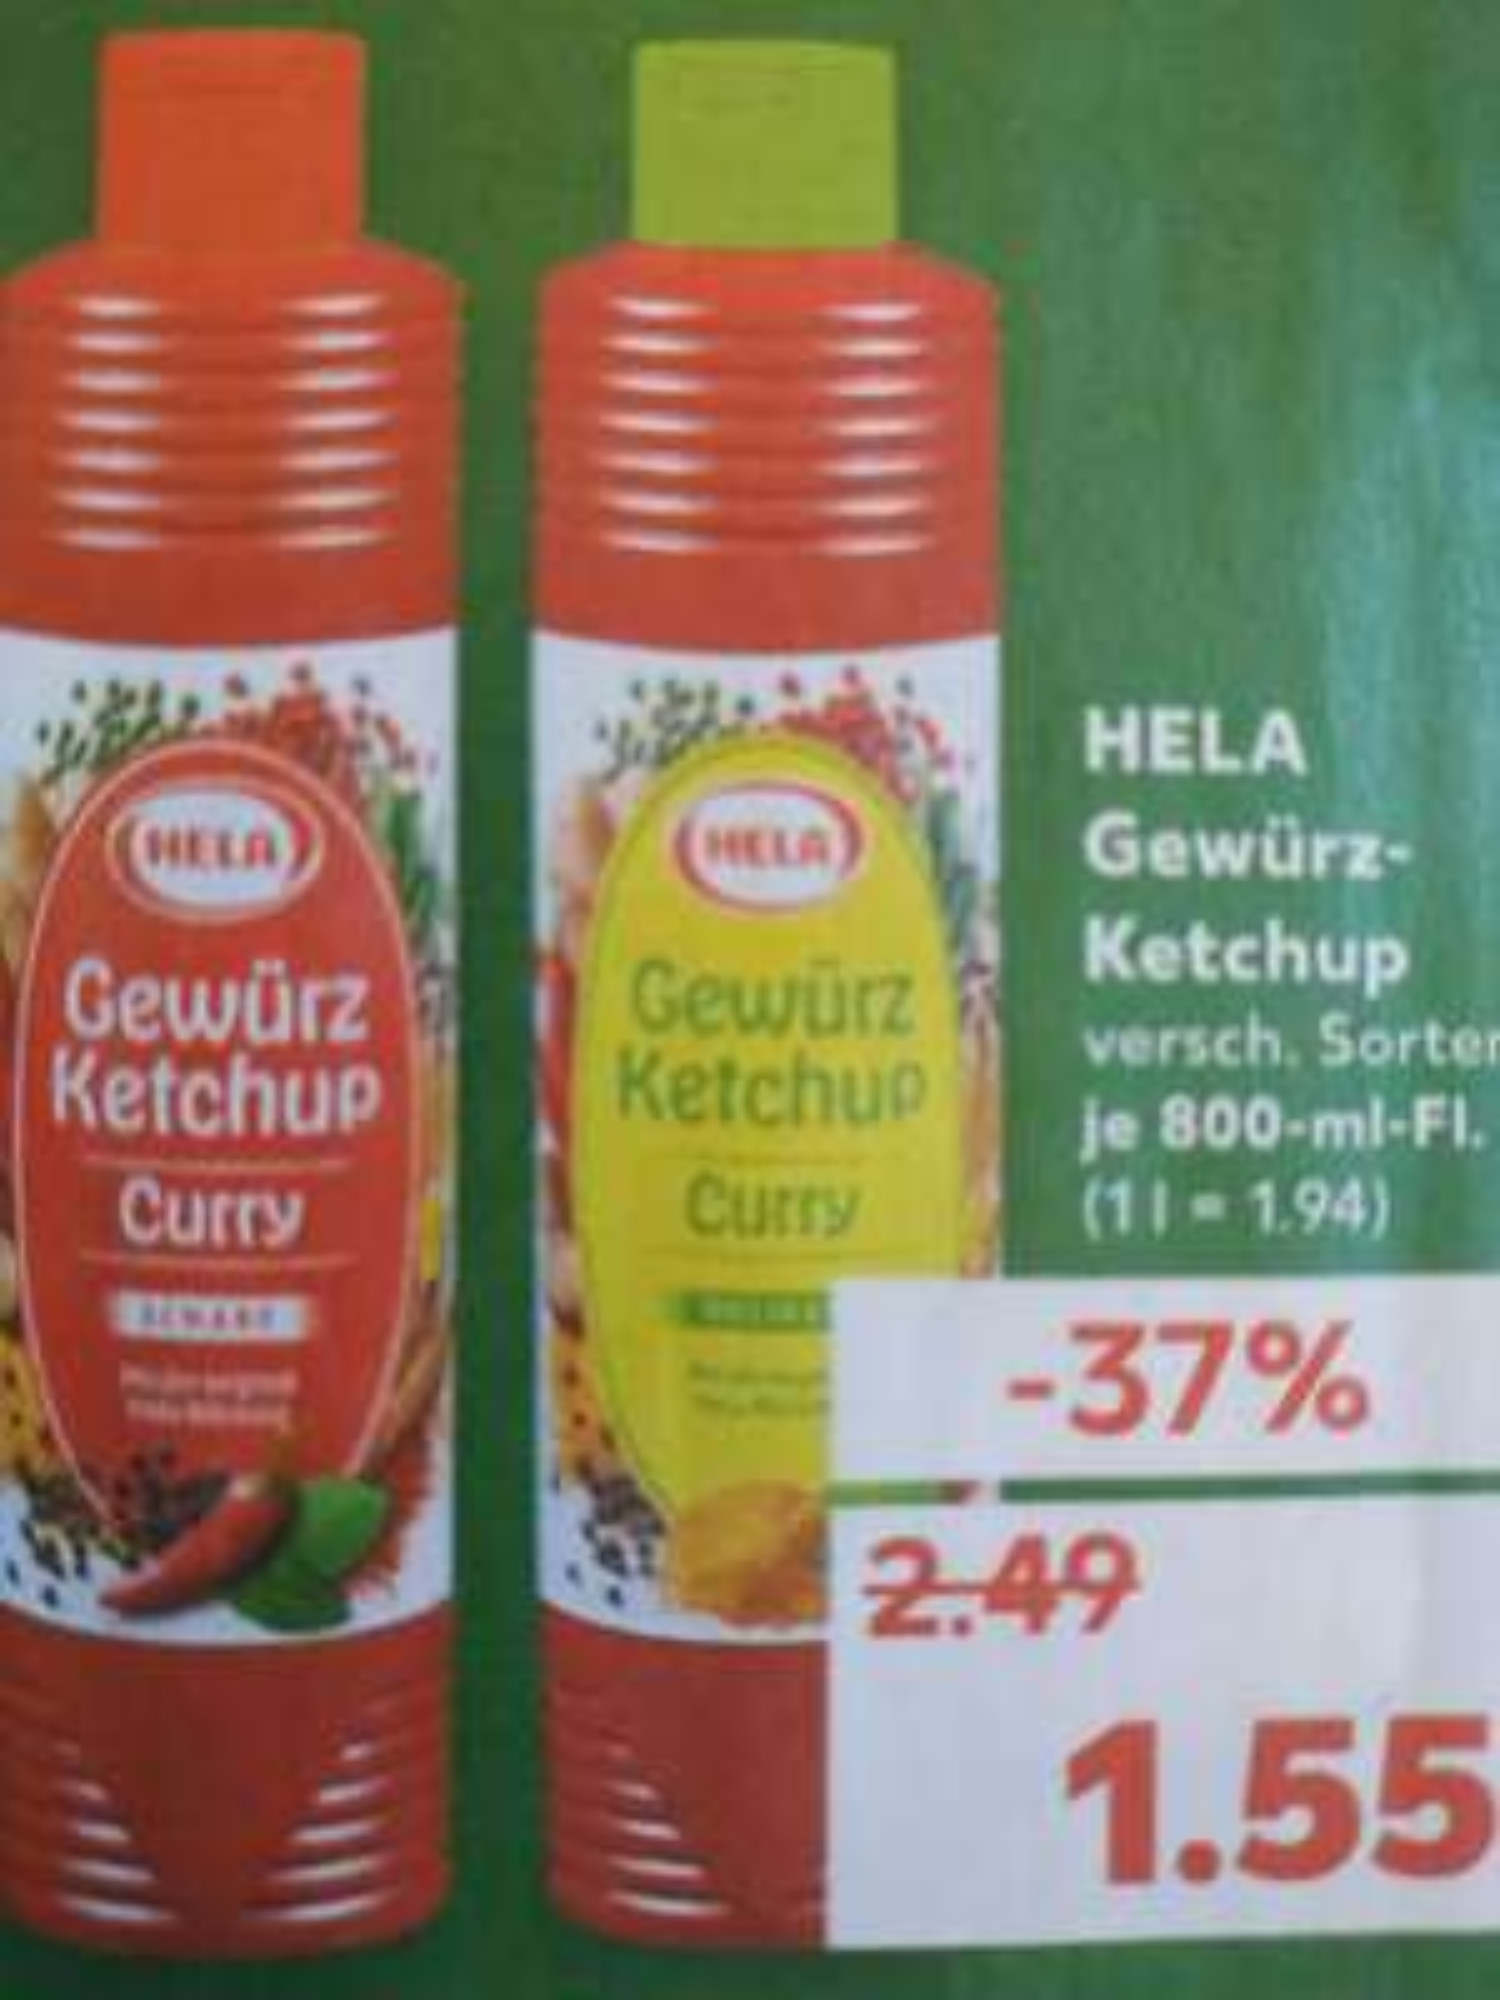 [Kaufland] HELA Curry Gewürz-Ketchup